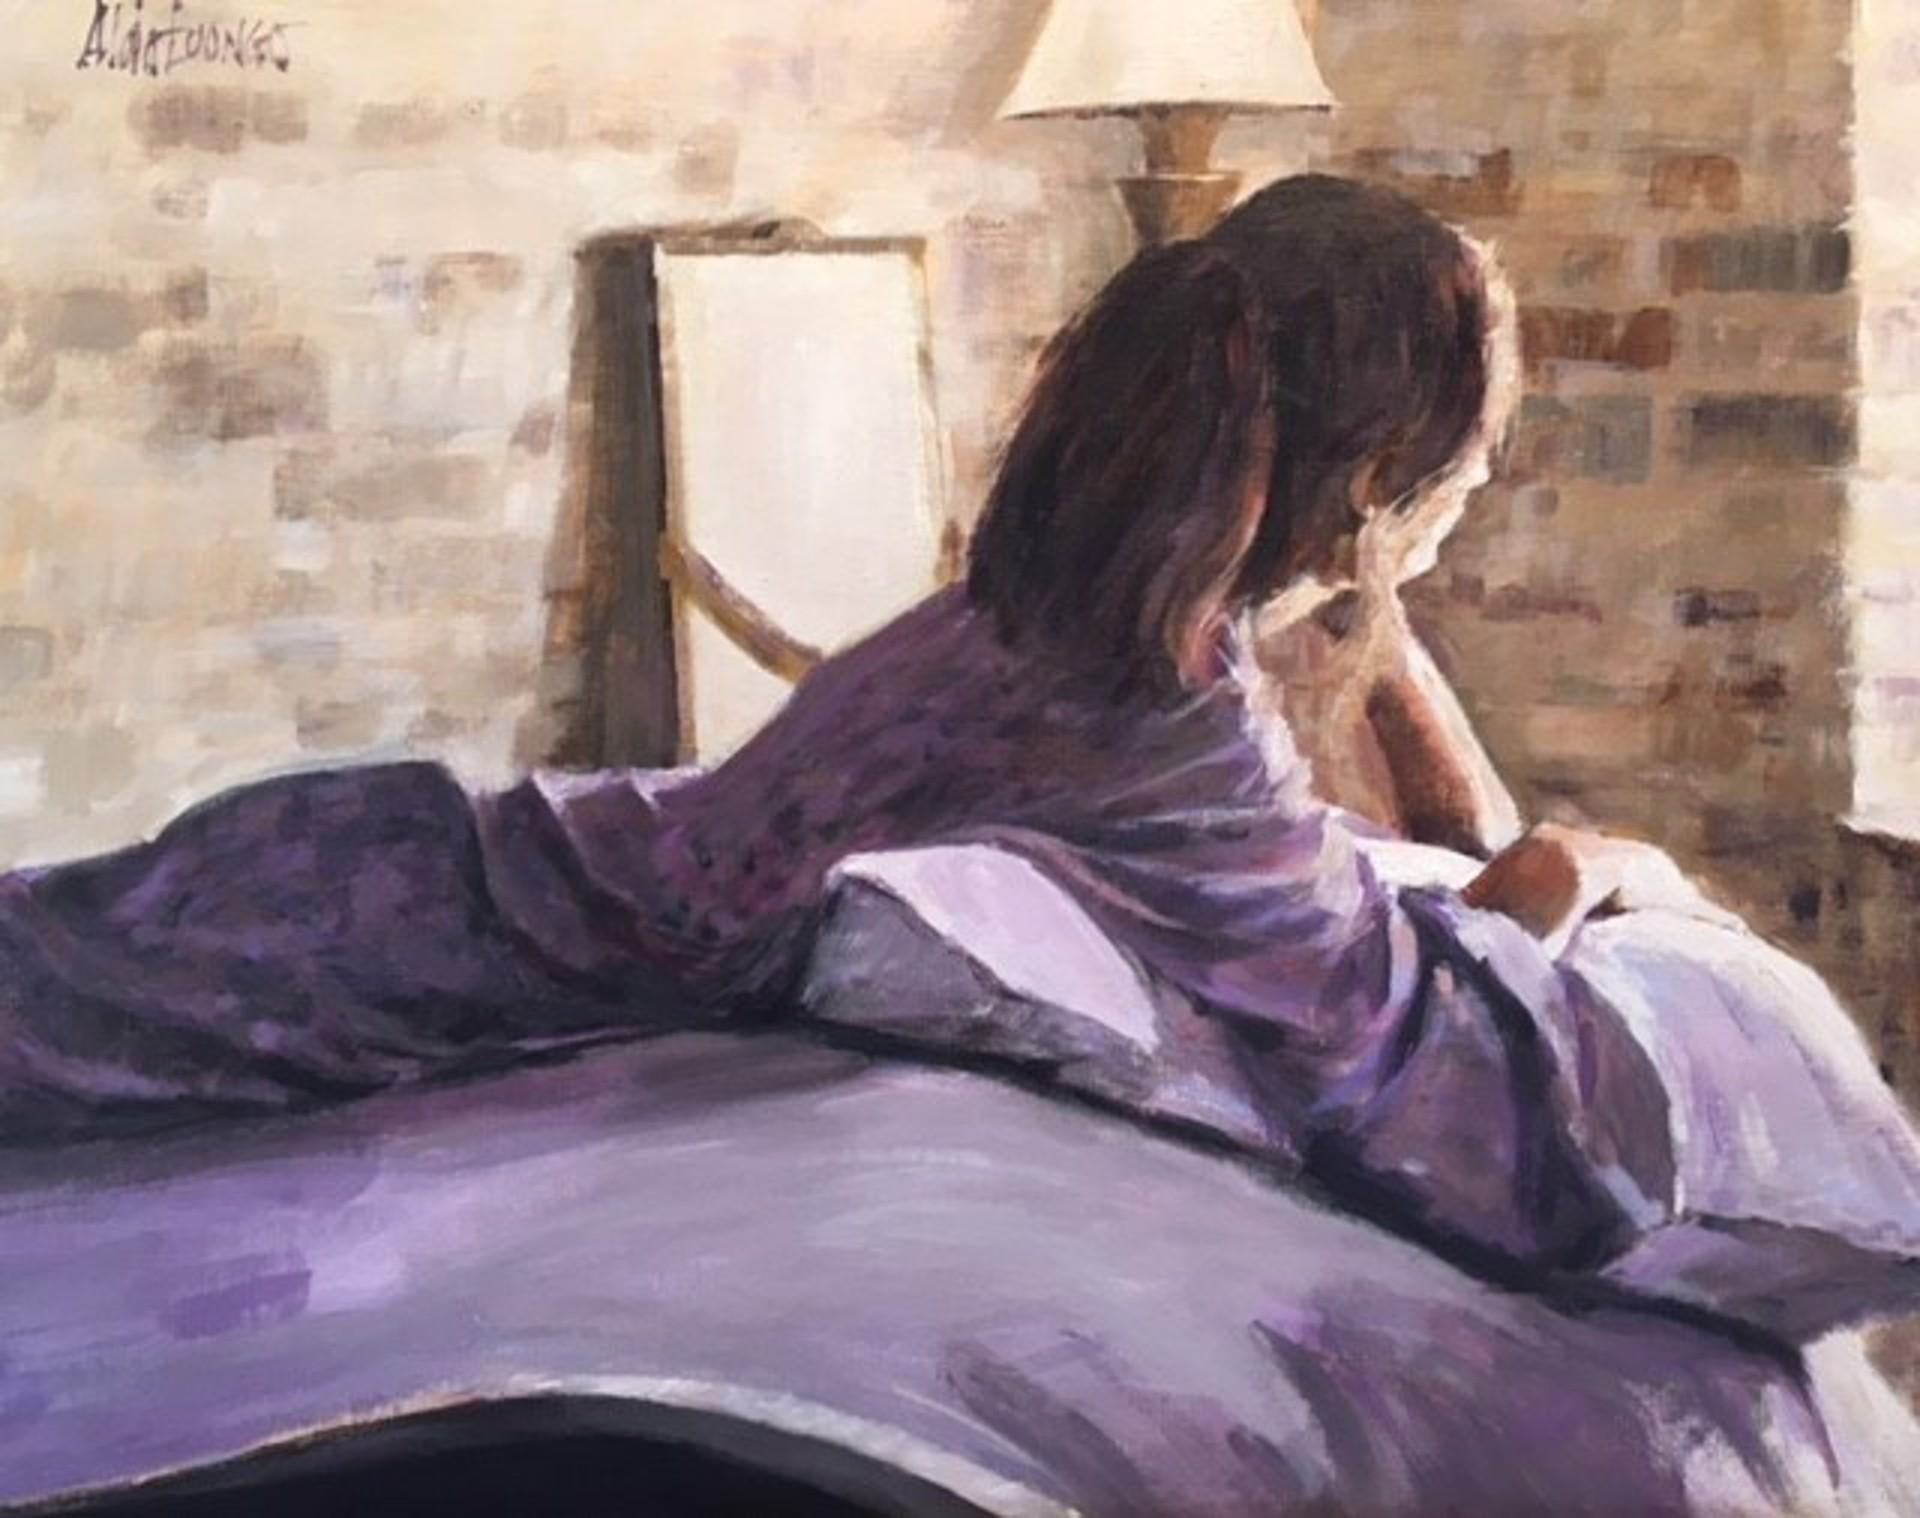 The Window by Aldo Luongo